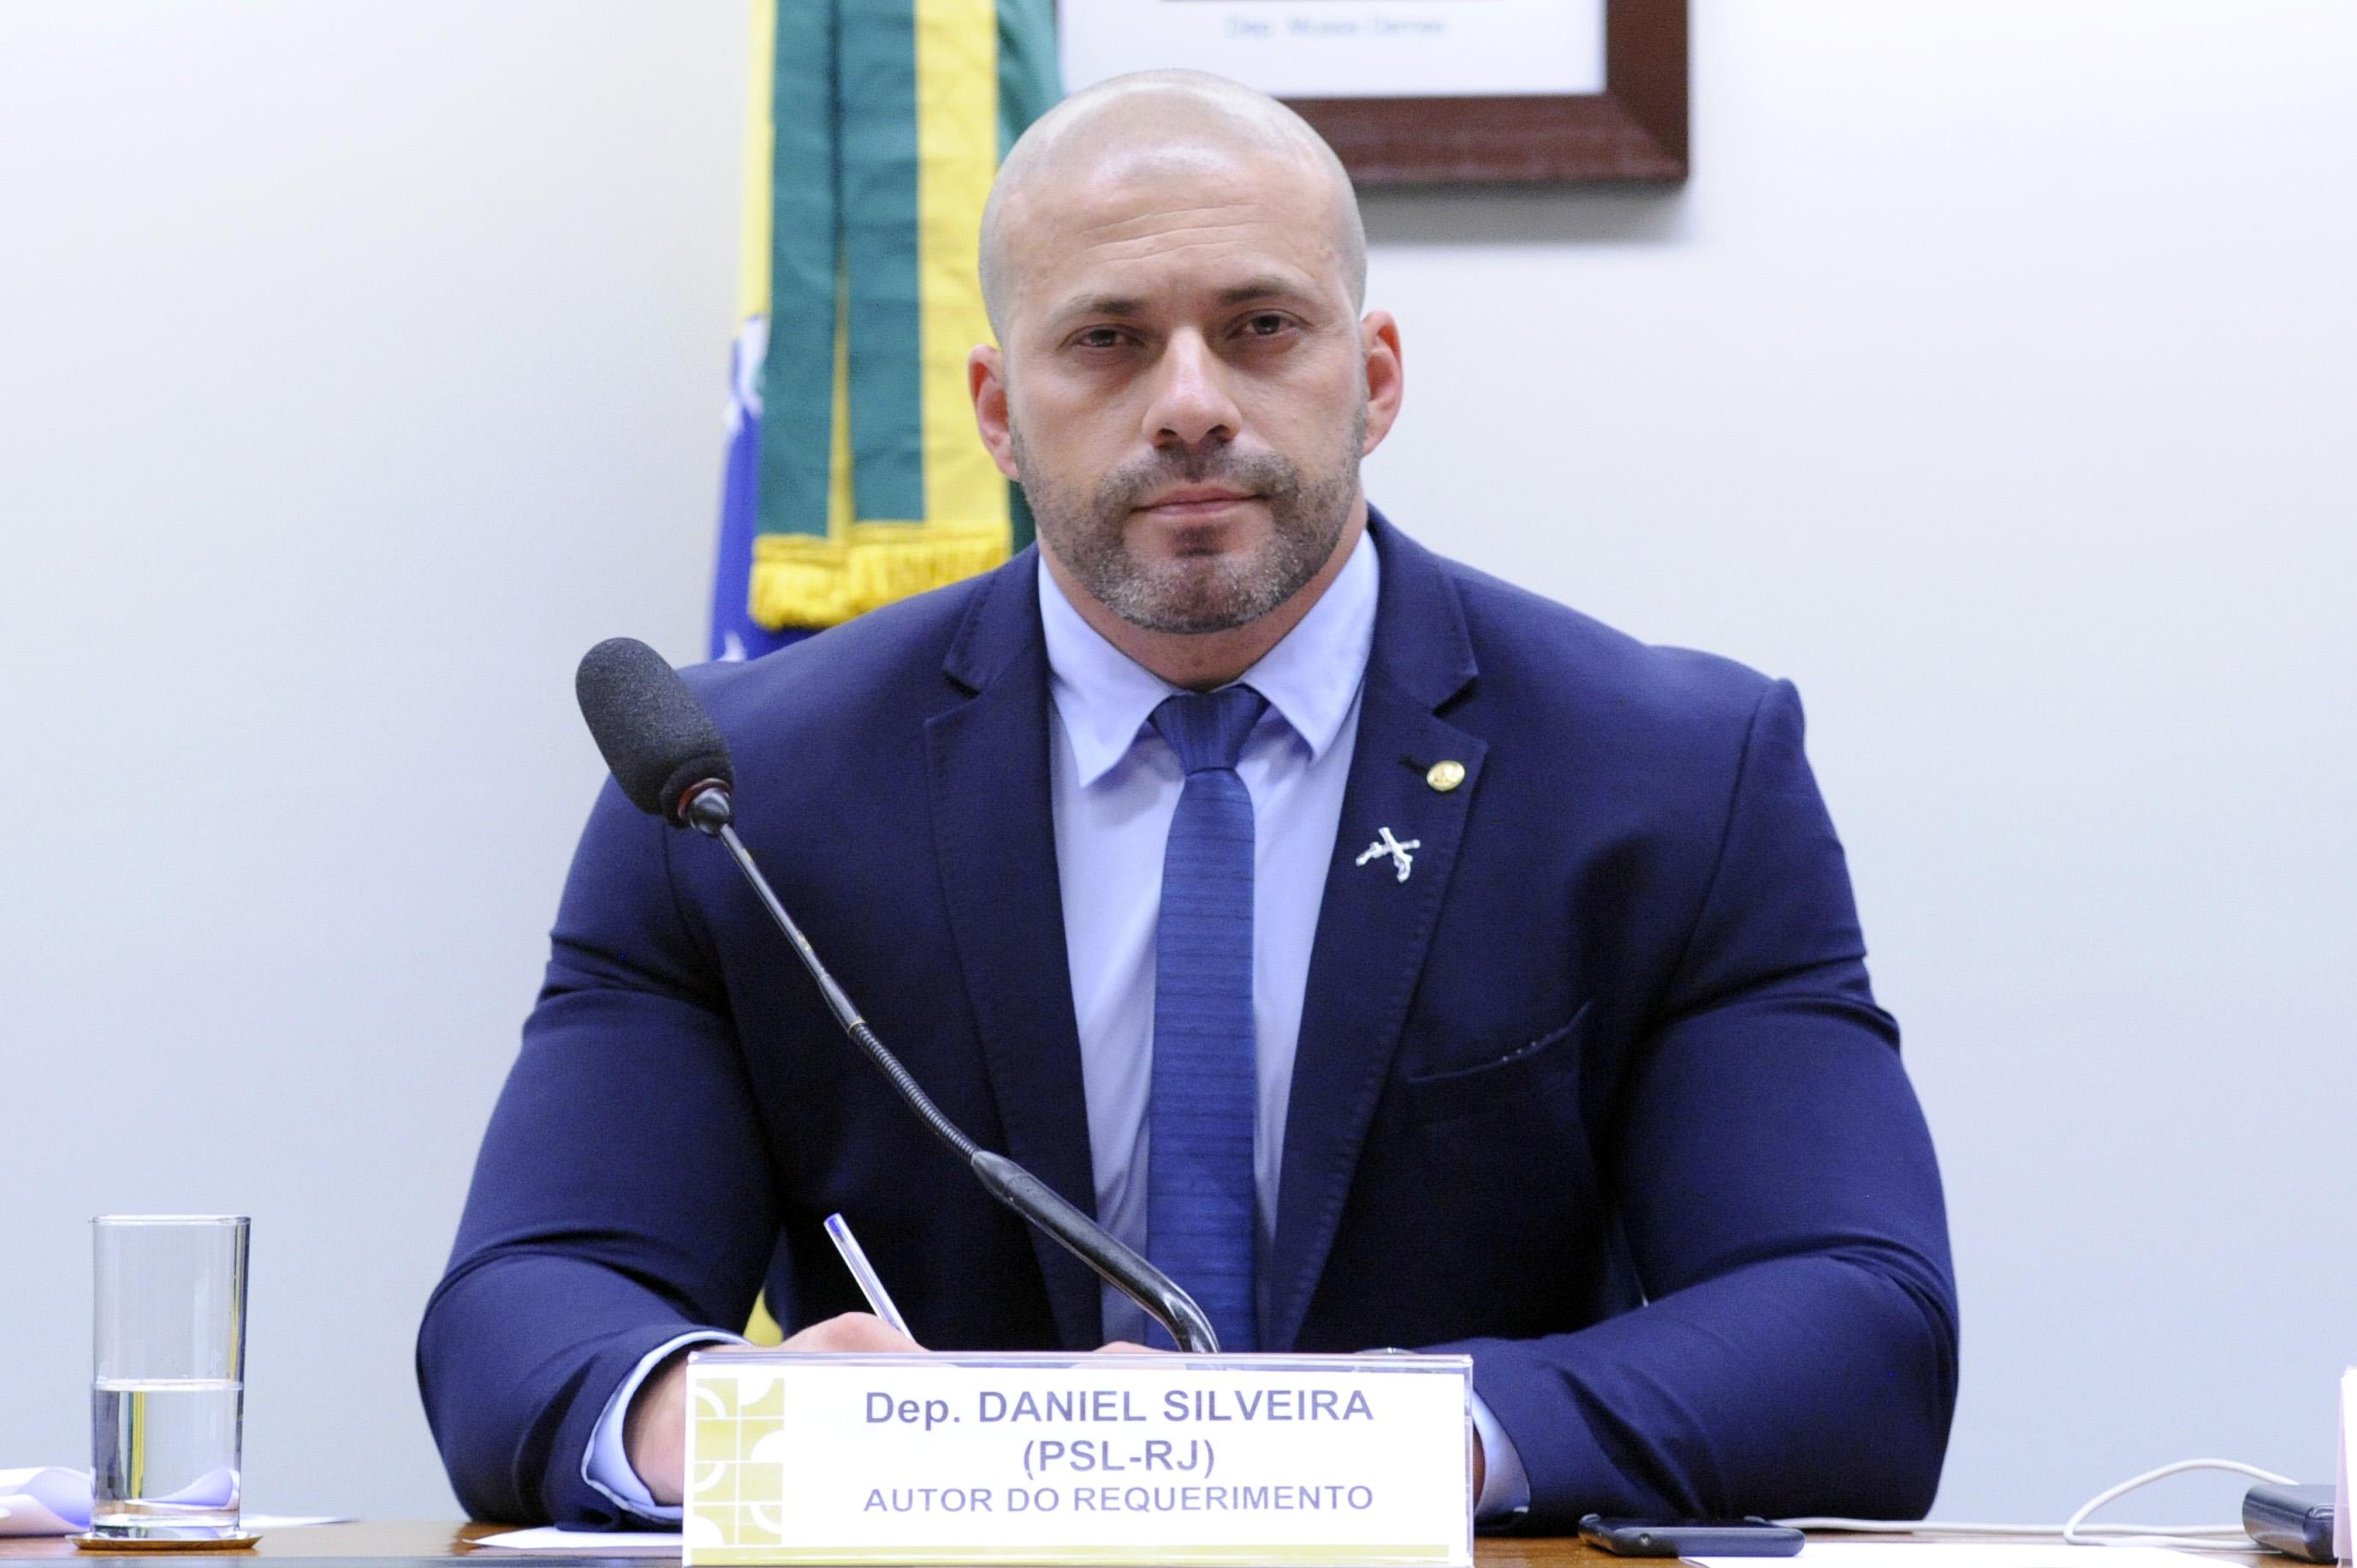 IMAGEM: Pros rachado no caso Daniel Silveira